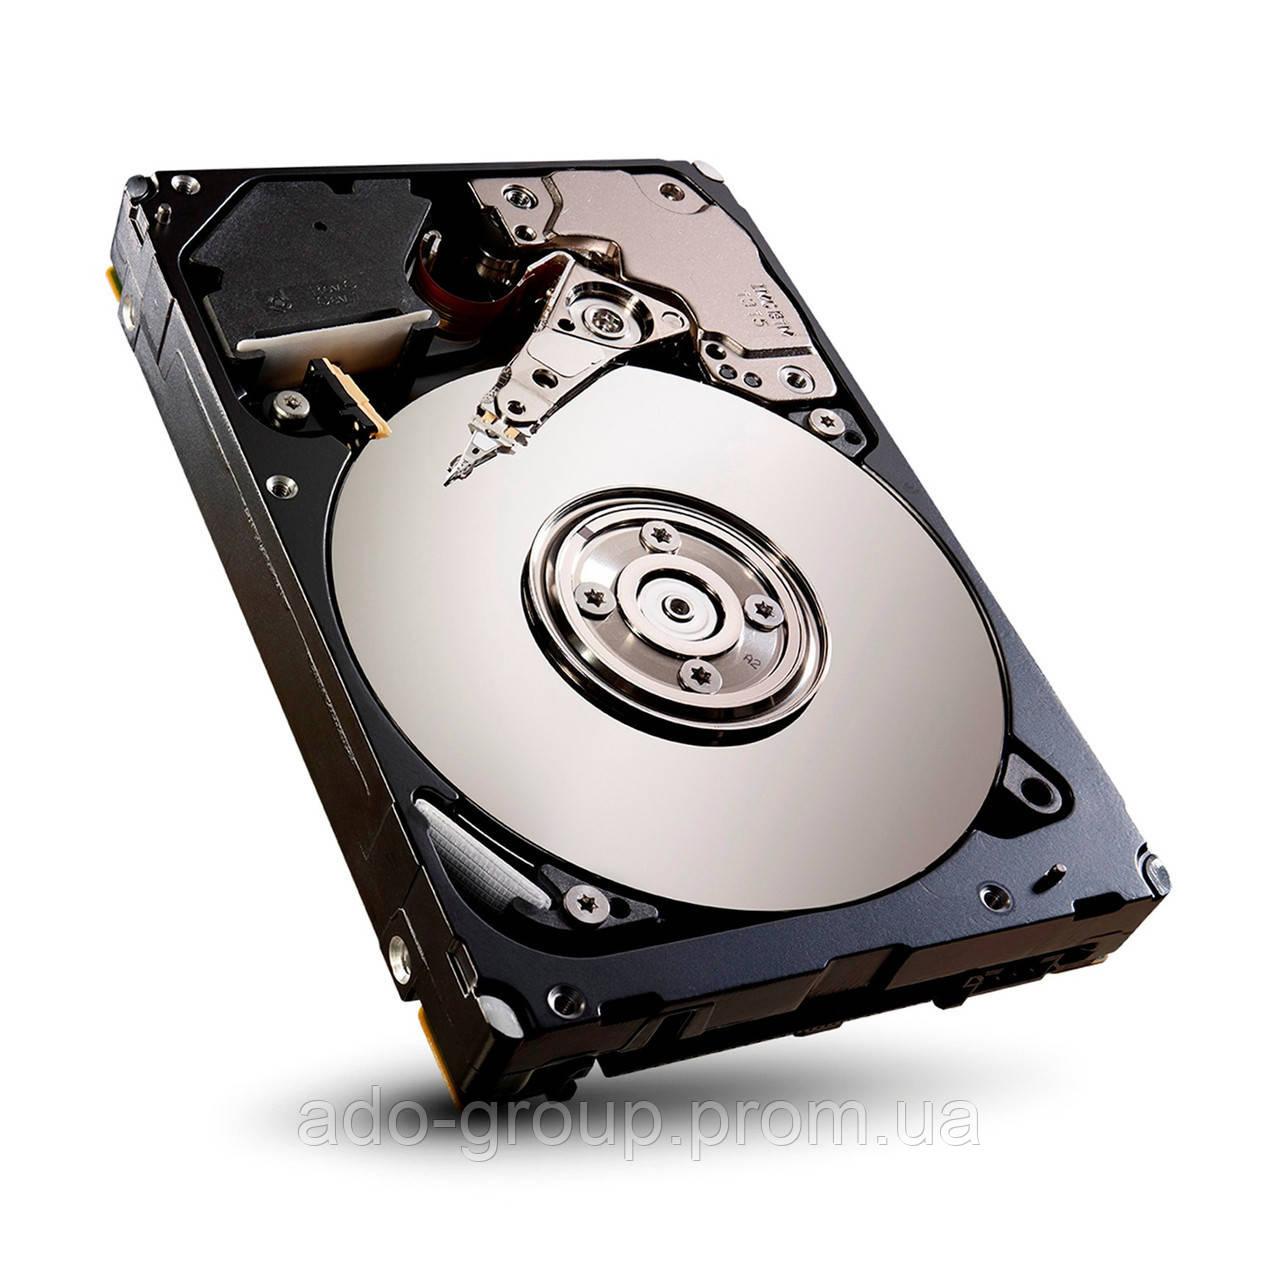 "96G91 Жесткий диск Dell 600GB SAS 10K  2.5"" +"